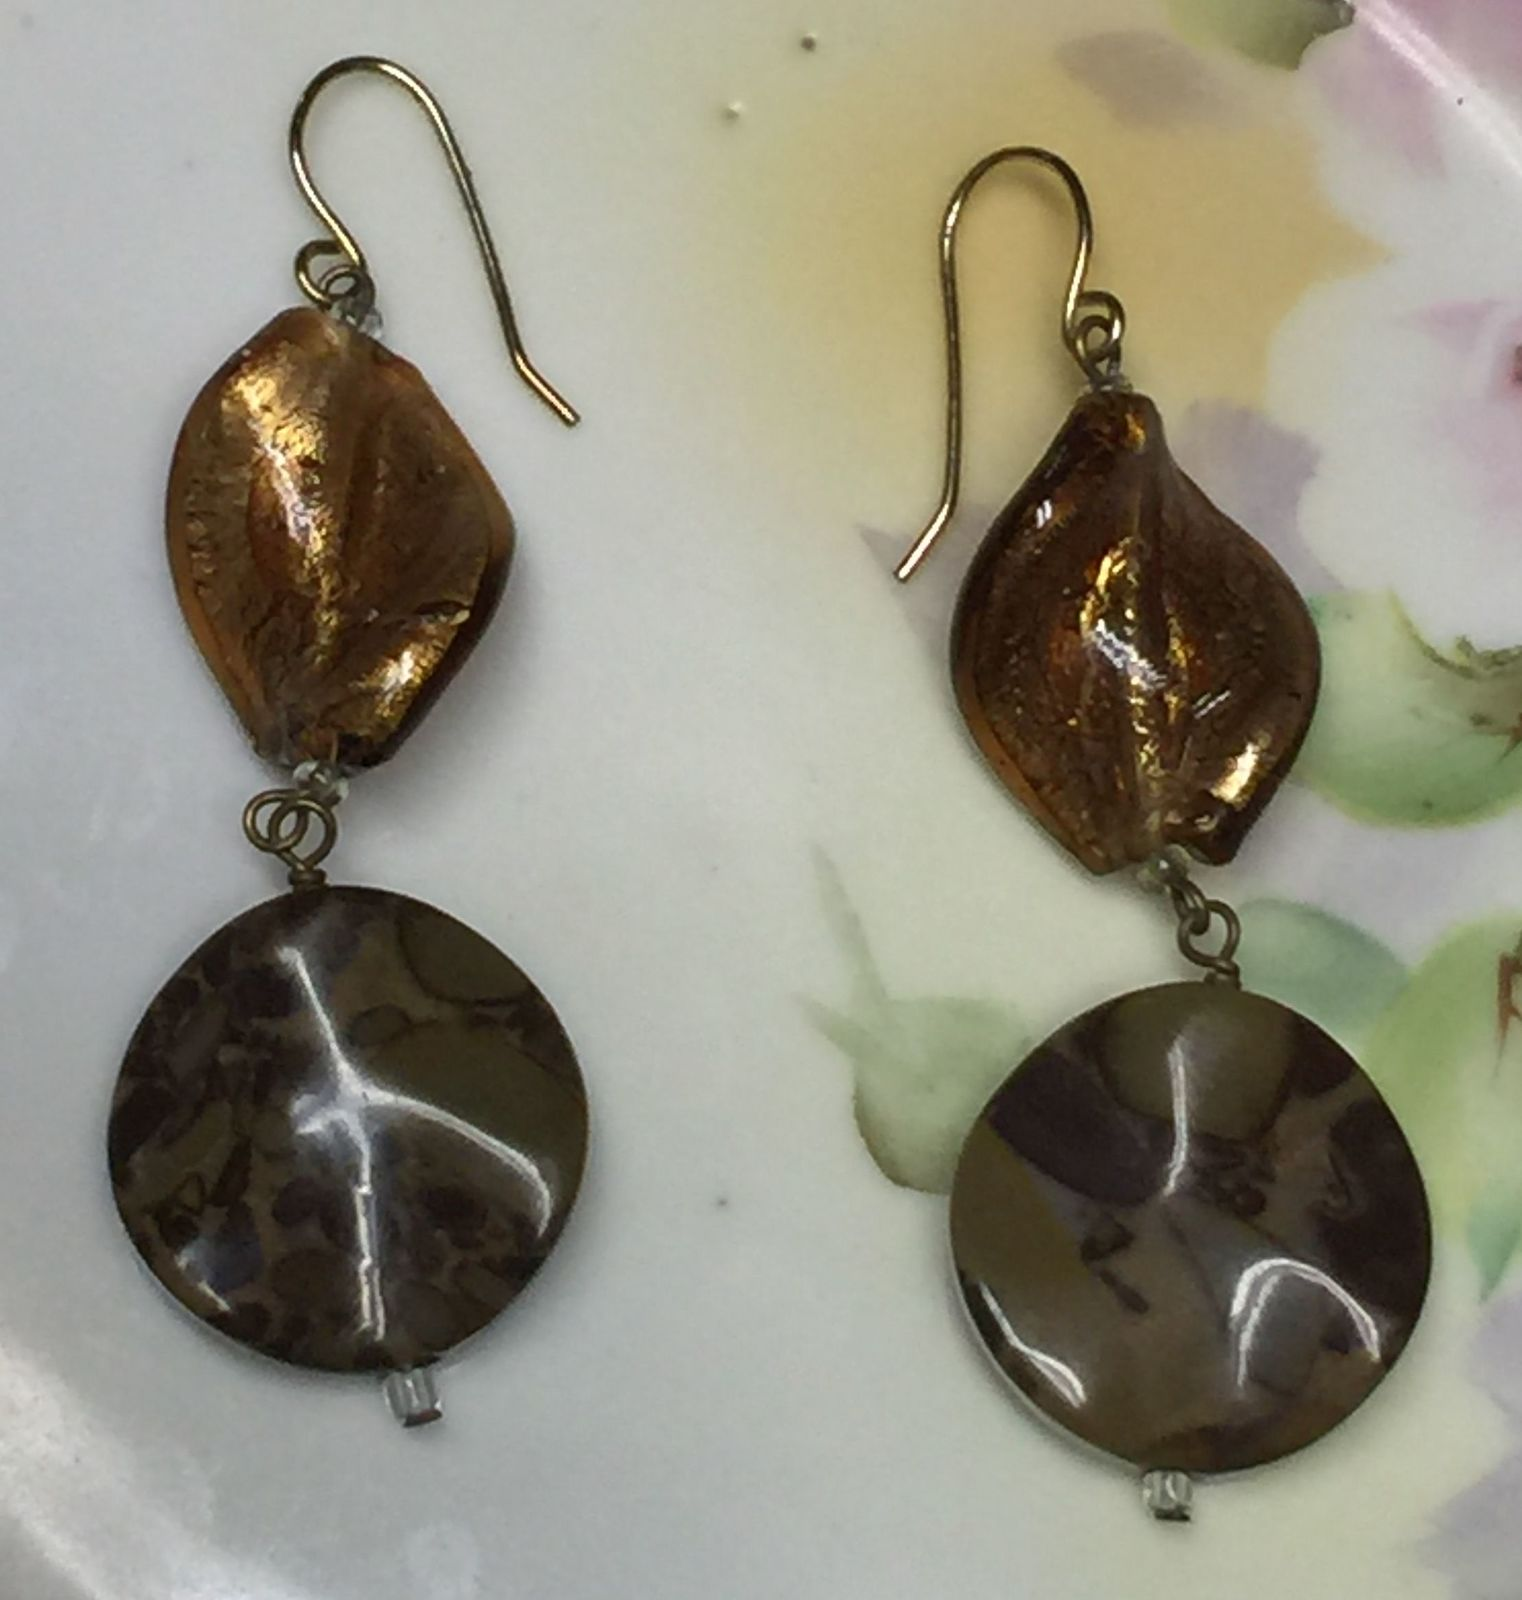 VTG Gold Metallic Brown Marble Look Plastic Beads Long Dangling Pierced Earrings image 2